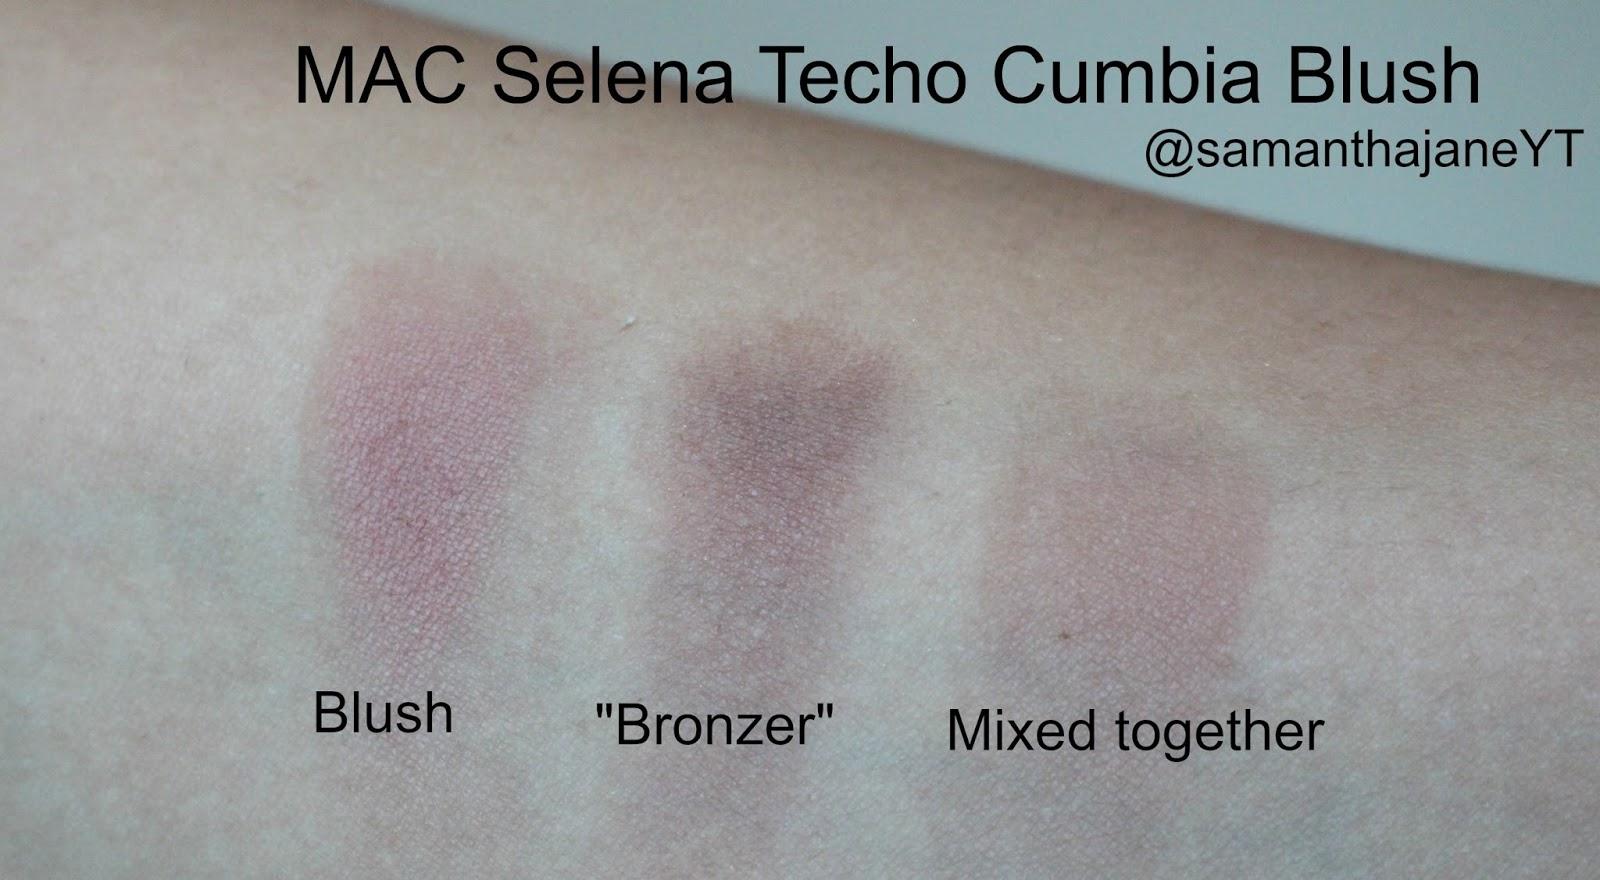 MAC Selena Techo Cumbia Blush Swatch